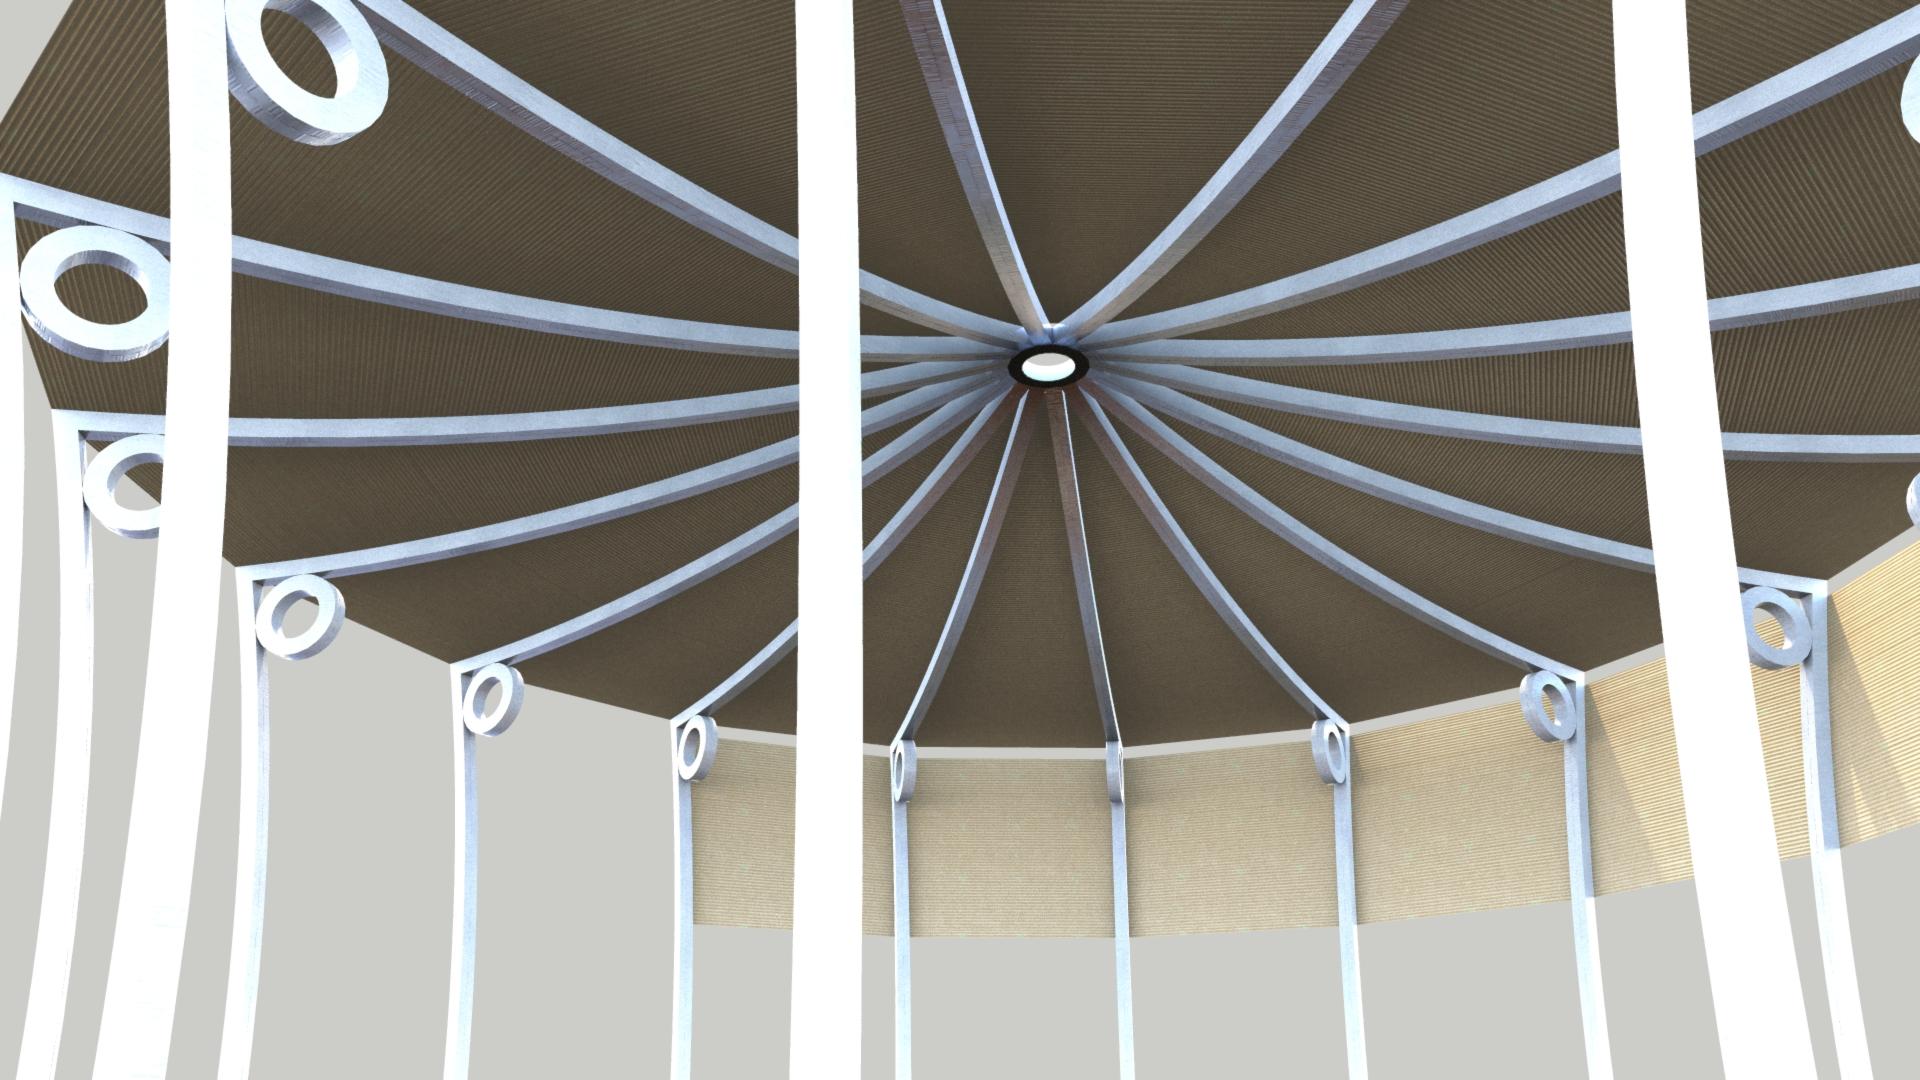 <p>spidermusica-3of10-detail-construction</p>